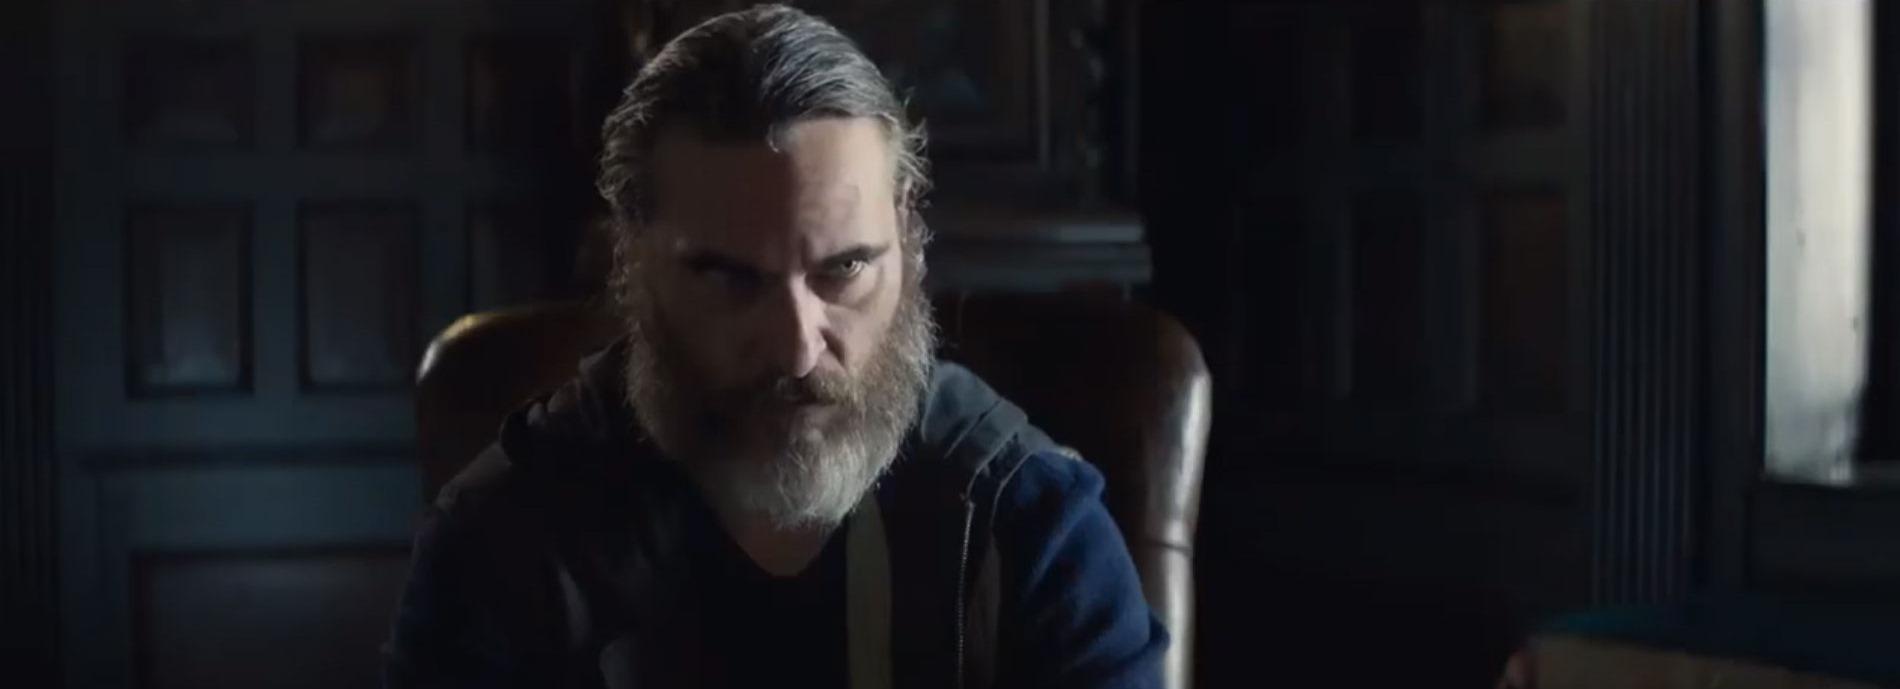 La-bande-annonce-du-film-A-beautiful-day-avec-Joaquin-Phoenix